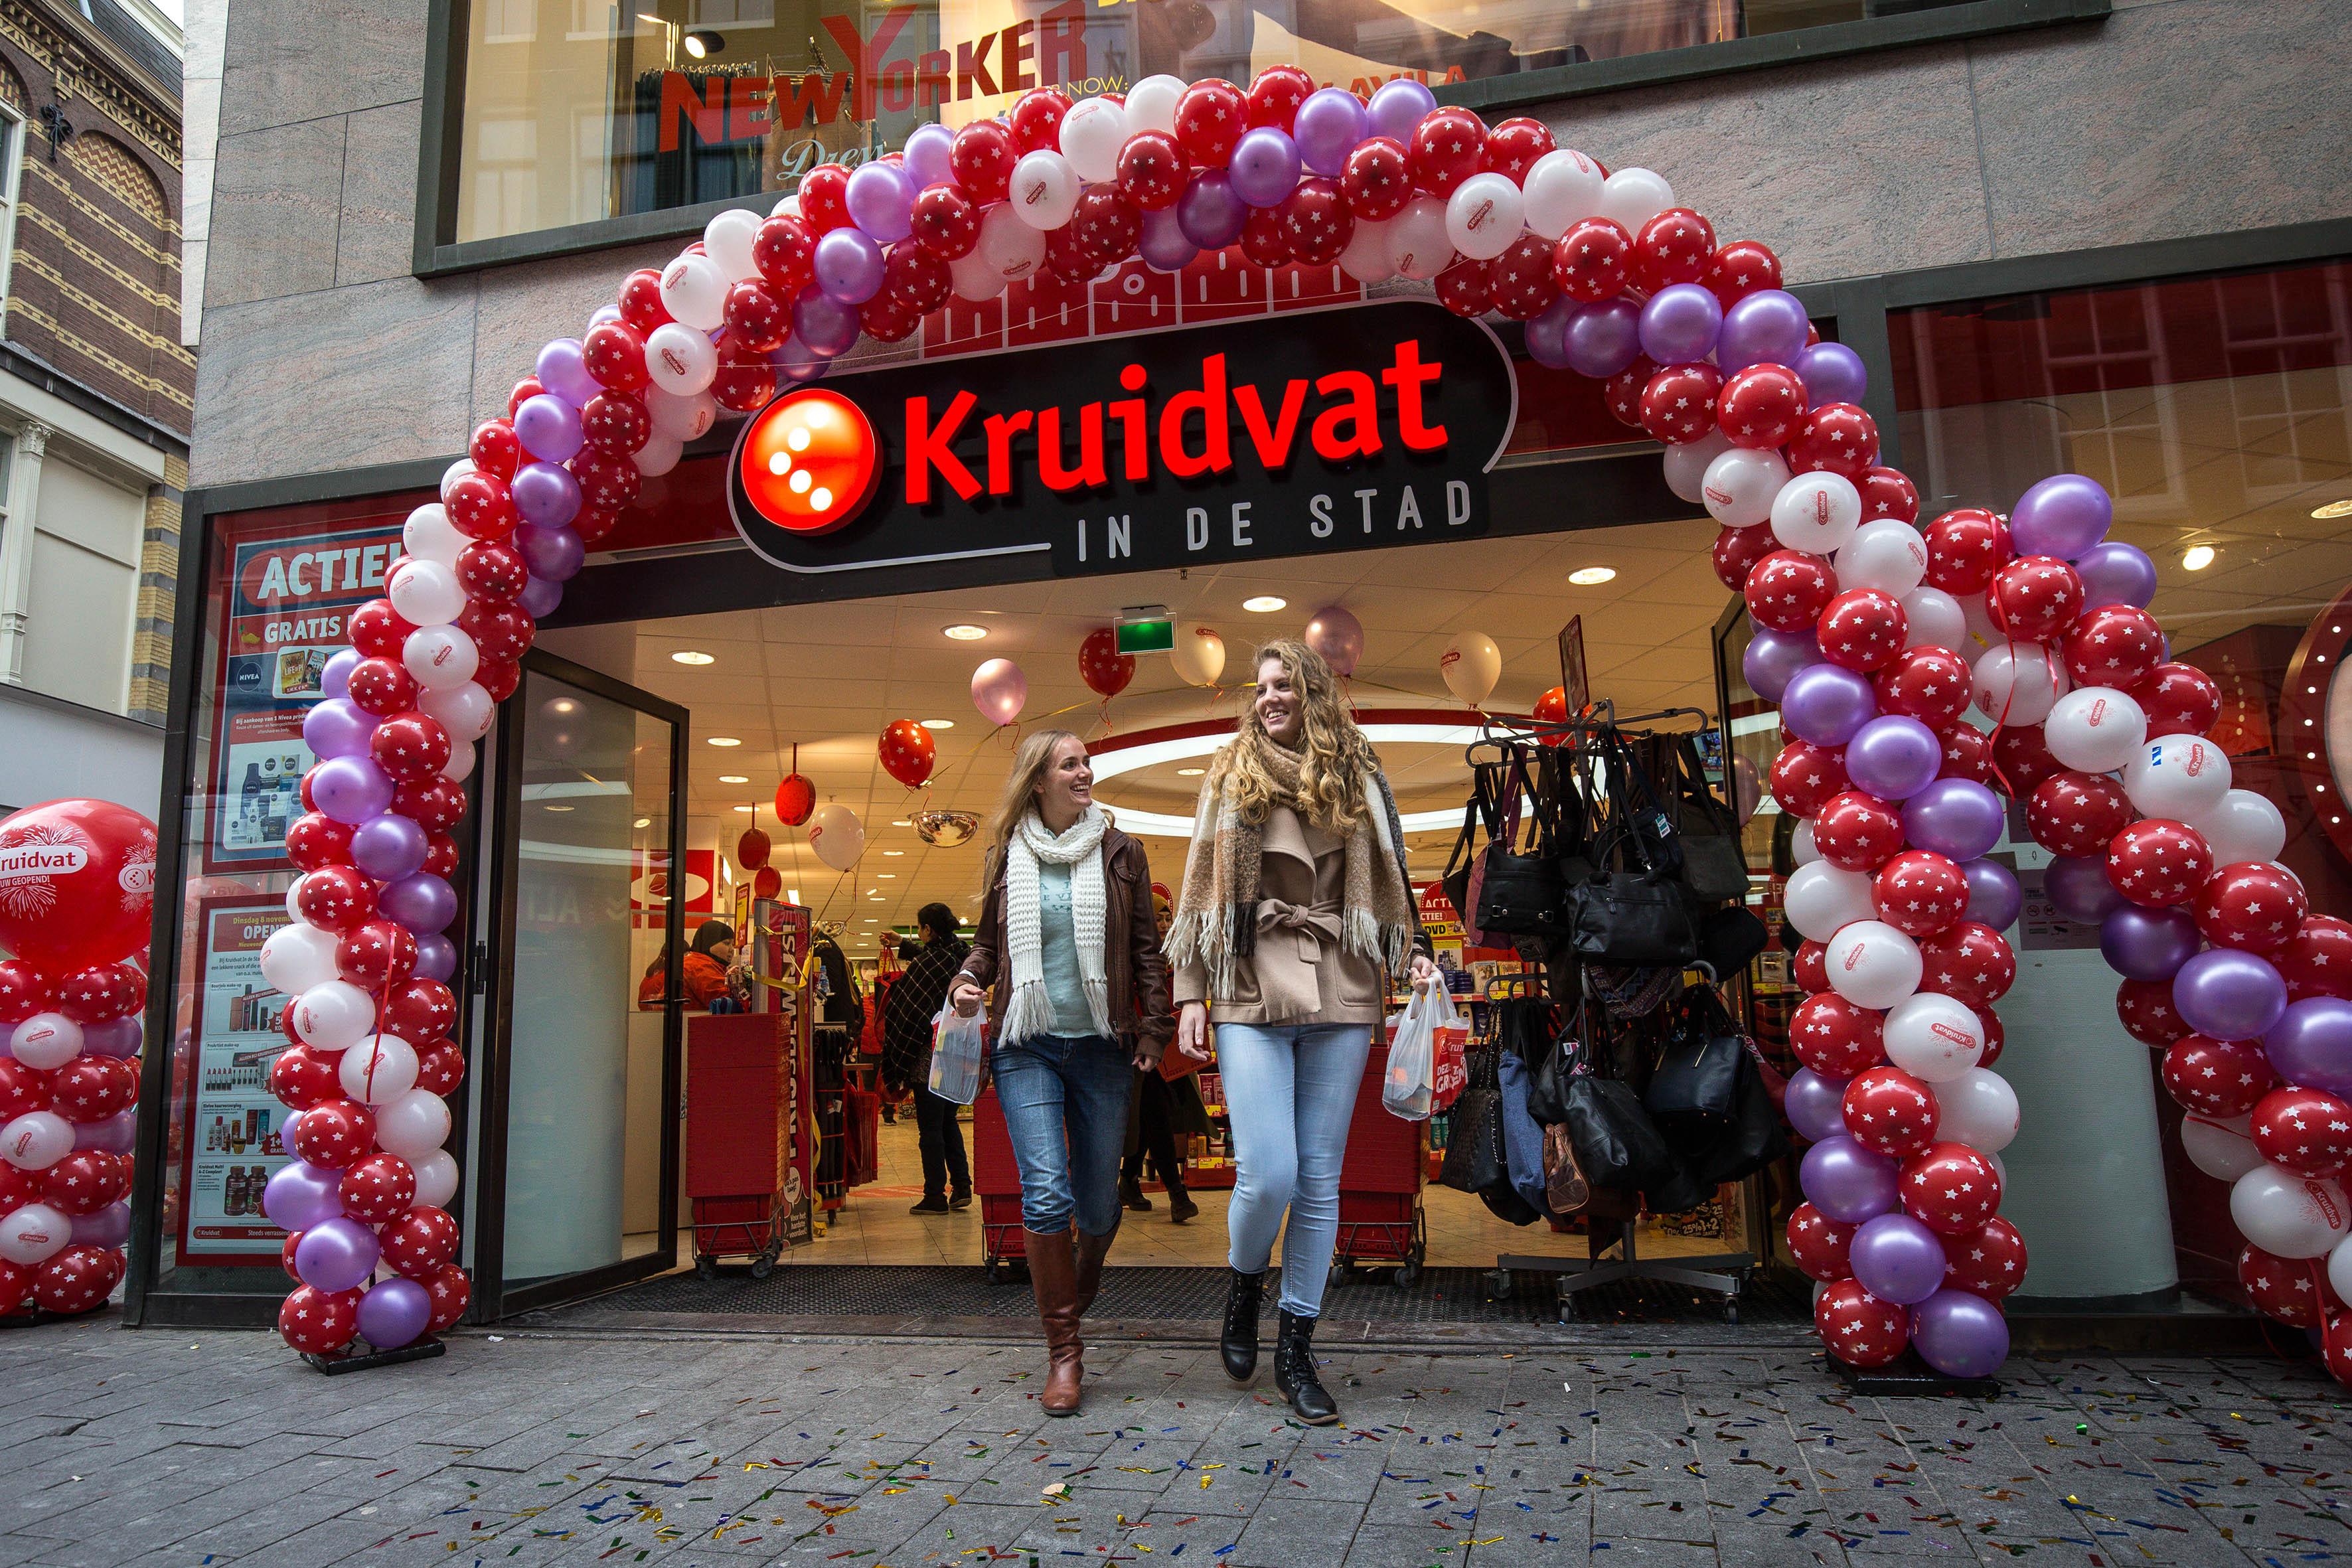 Kruidvat vernieuwt winkelconcept, winkel Roermond blauwdruk